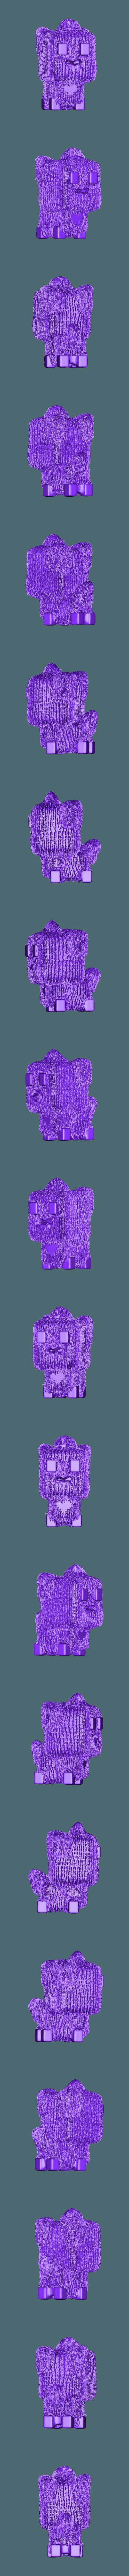 hairydog.stl Download free STL file test print cube dog, test print cube dog • 3D printer object, gaaraa